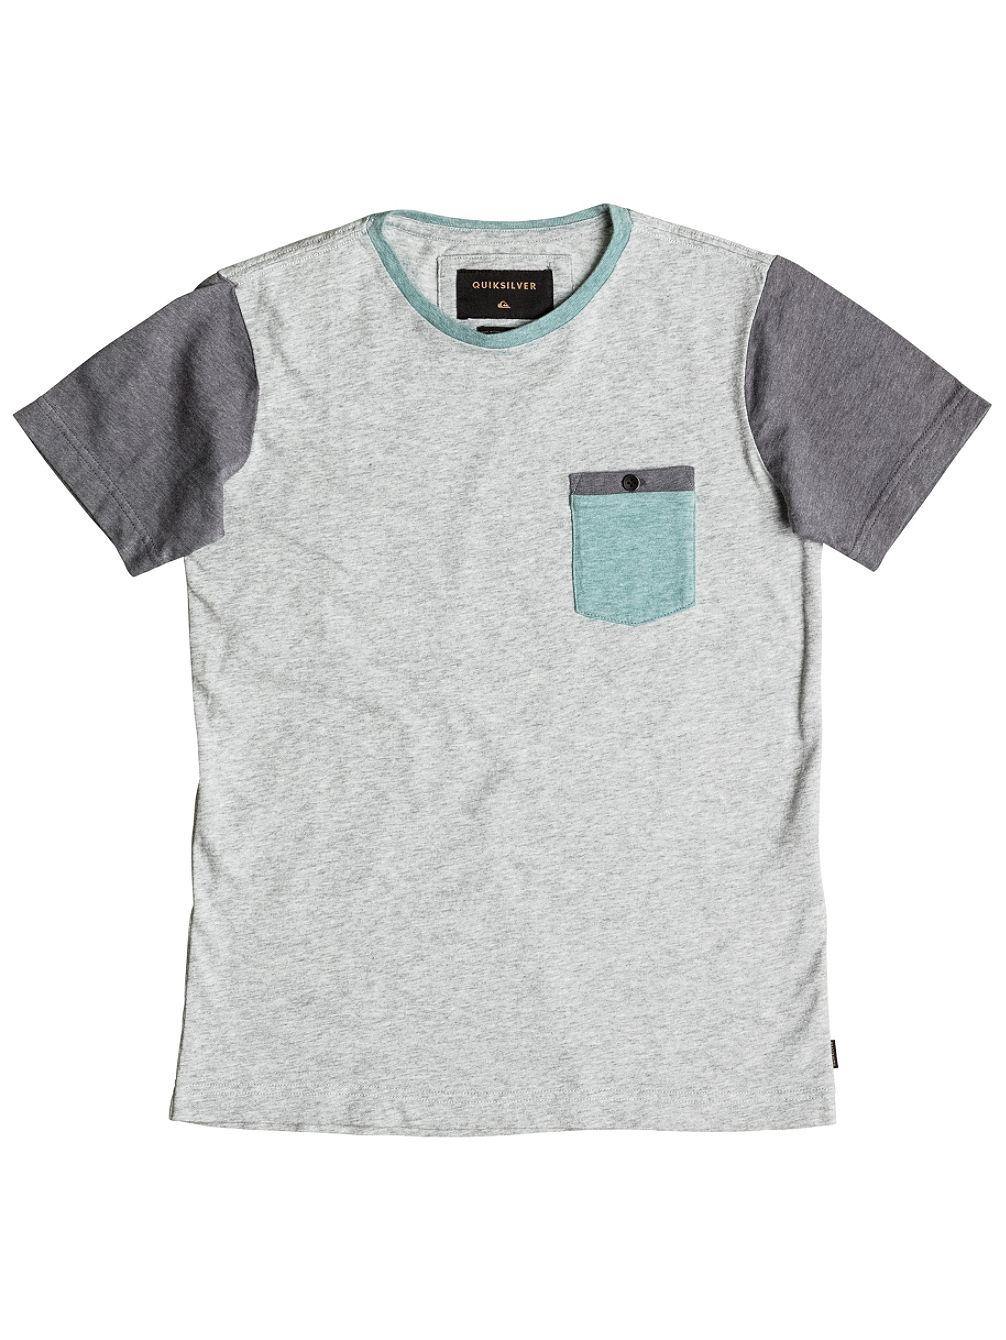 quiksilver-baysic-pocket-t-shirt-boys